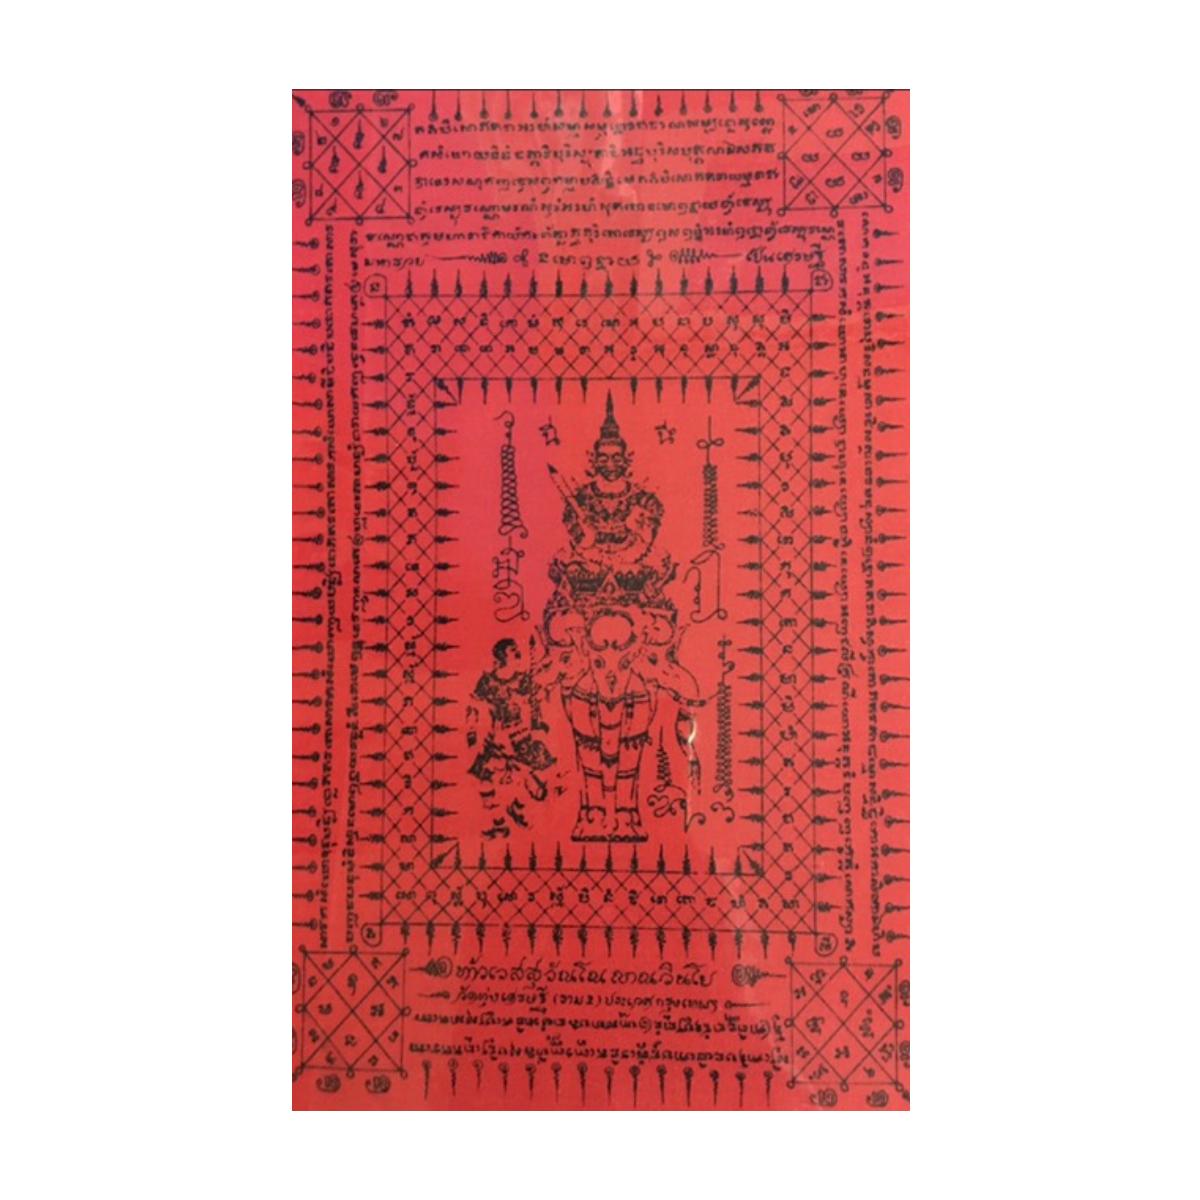 Taowessuwaan Fabric Amulet 1